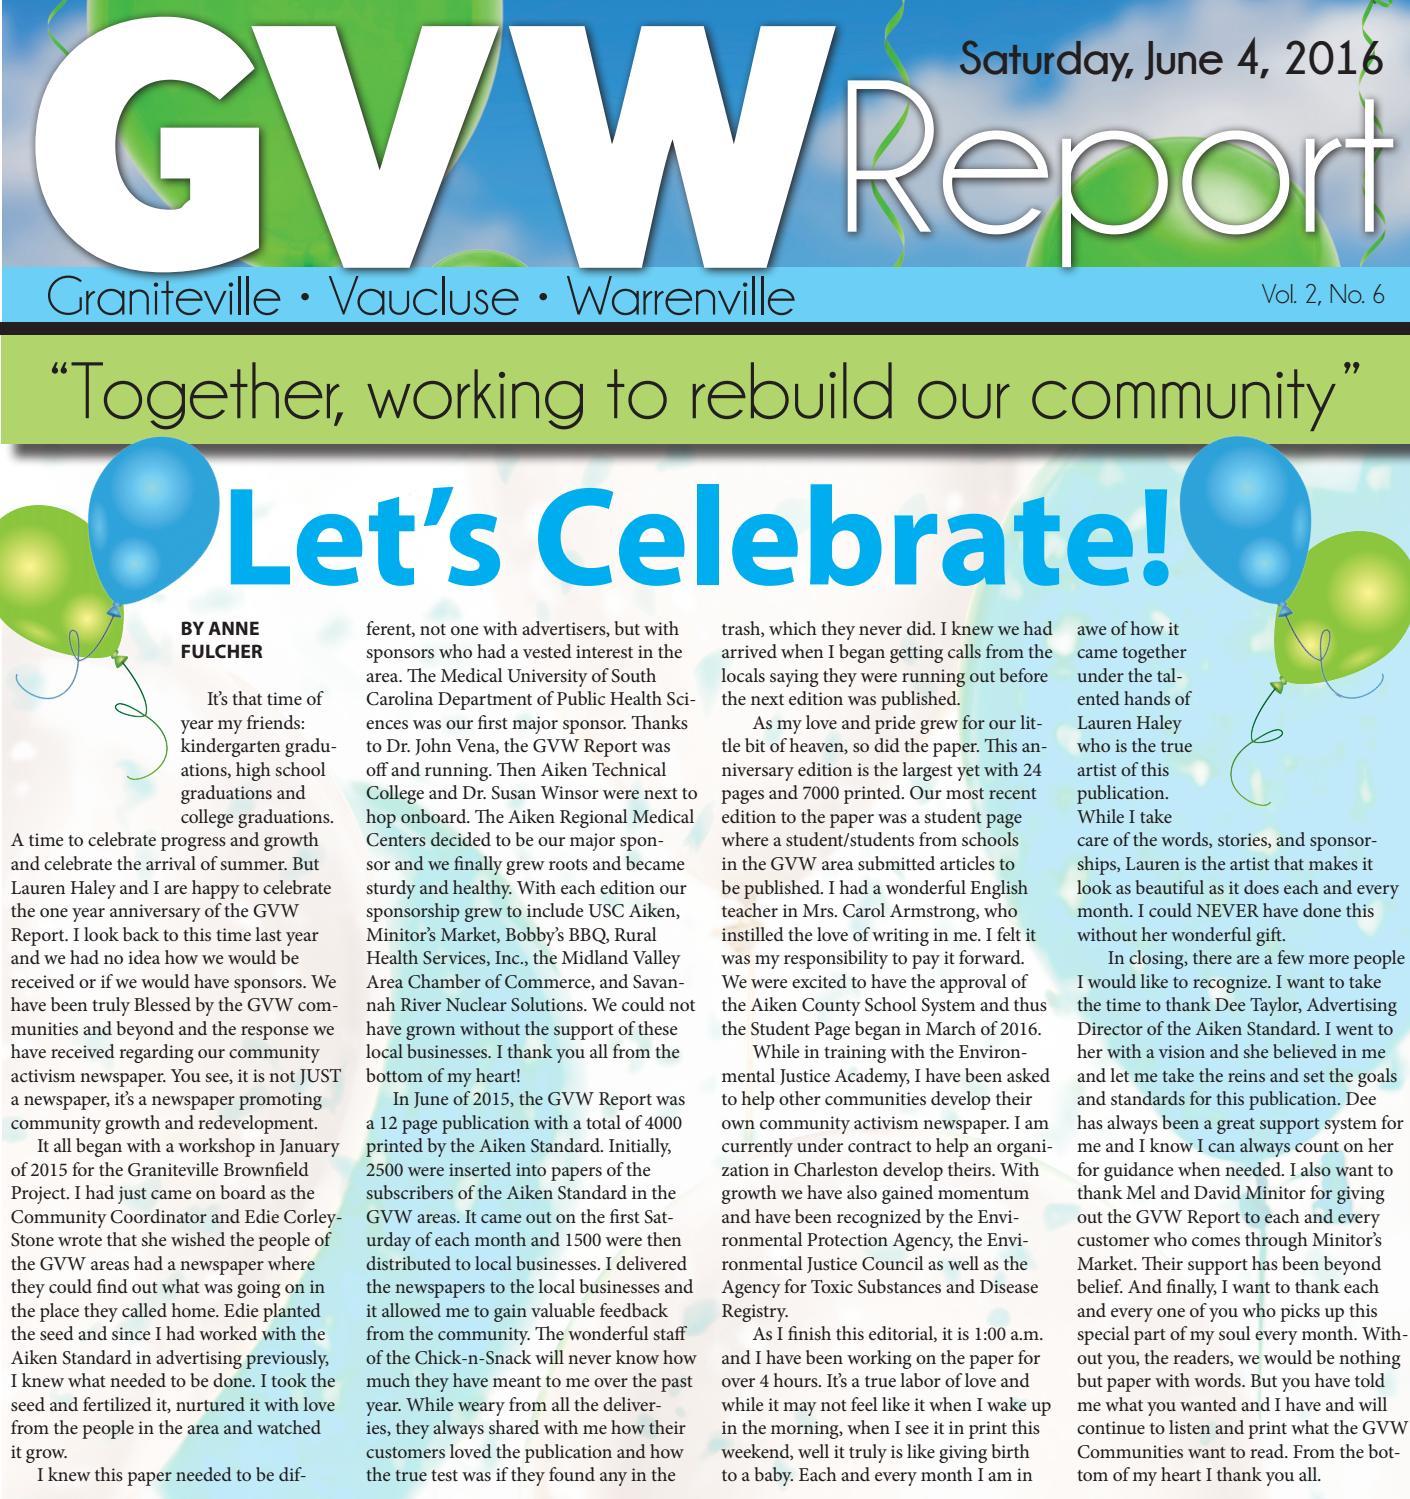 GVW Report June 2016 by Lauren A. Haley - issuu